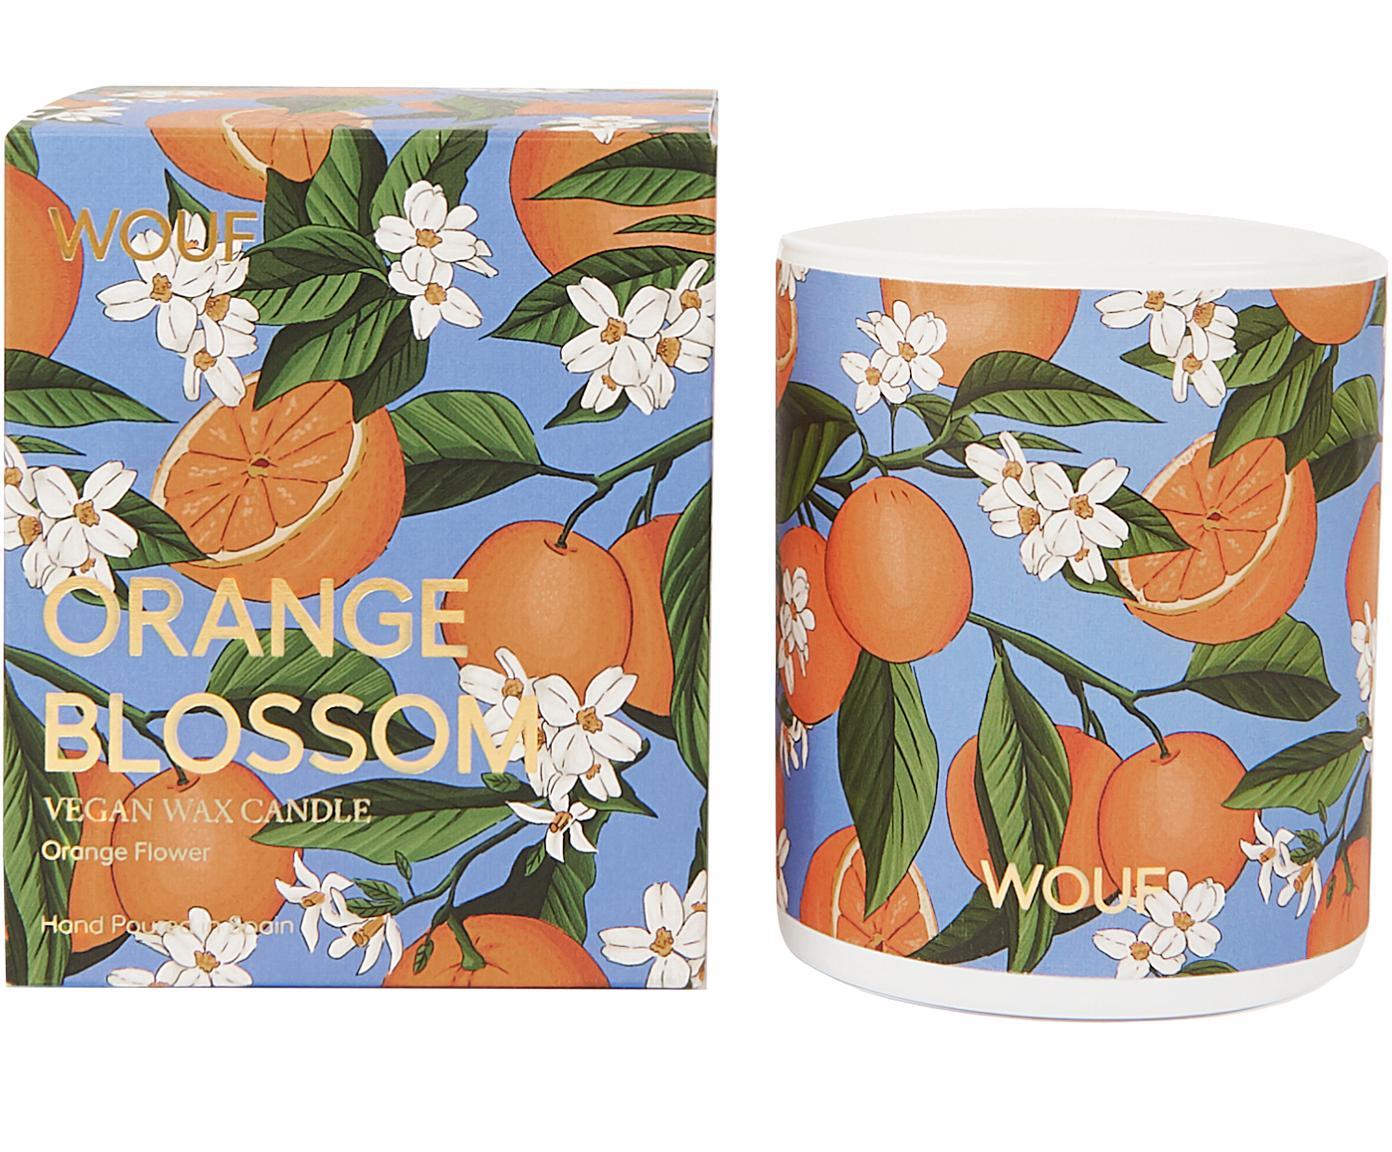 Geurkaars Orange Blossom (oranjebloesem), 100% plantaardige was, Oranje, blauw, Ø 8 x H 10 cm